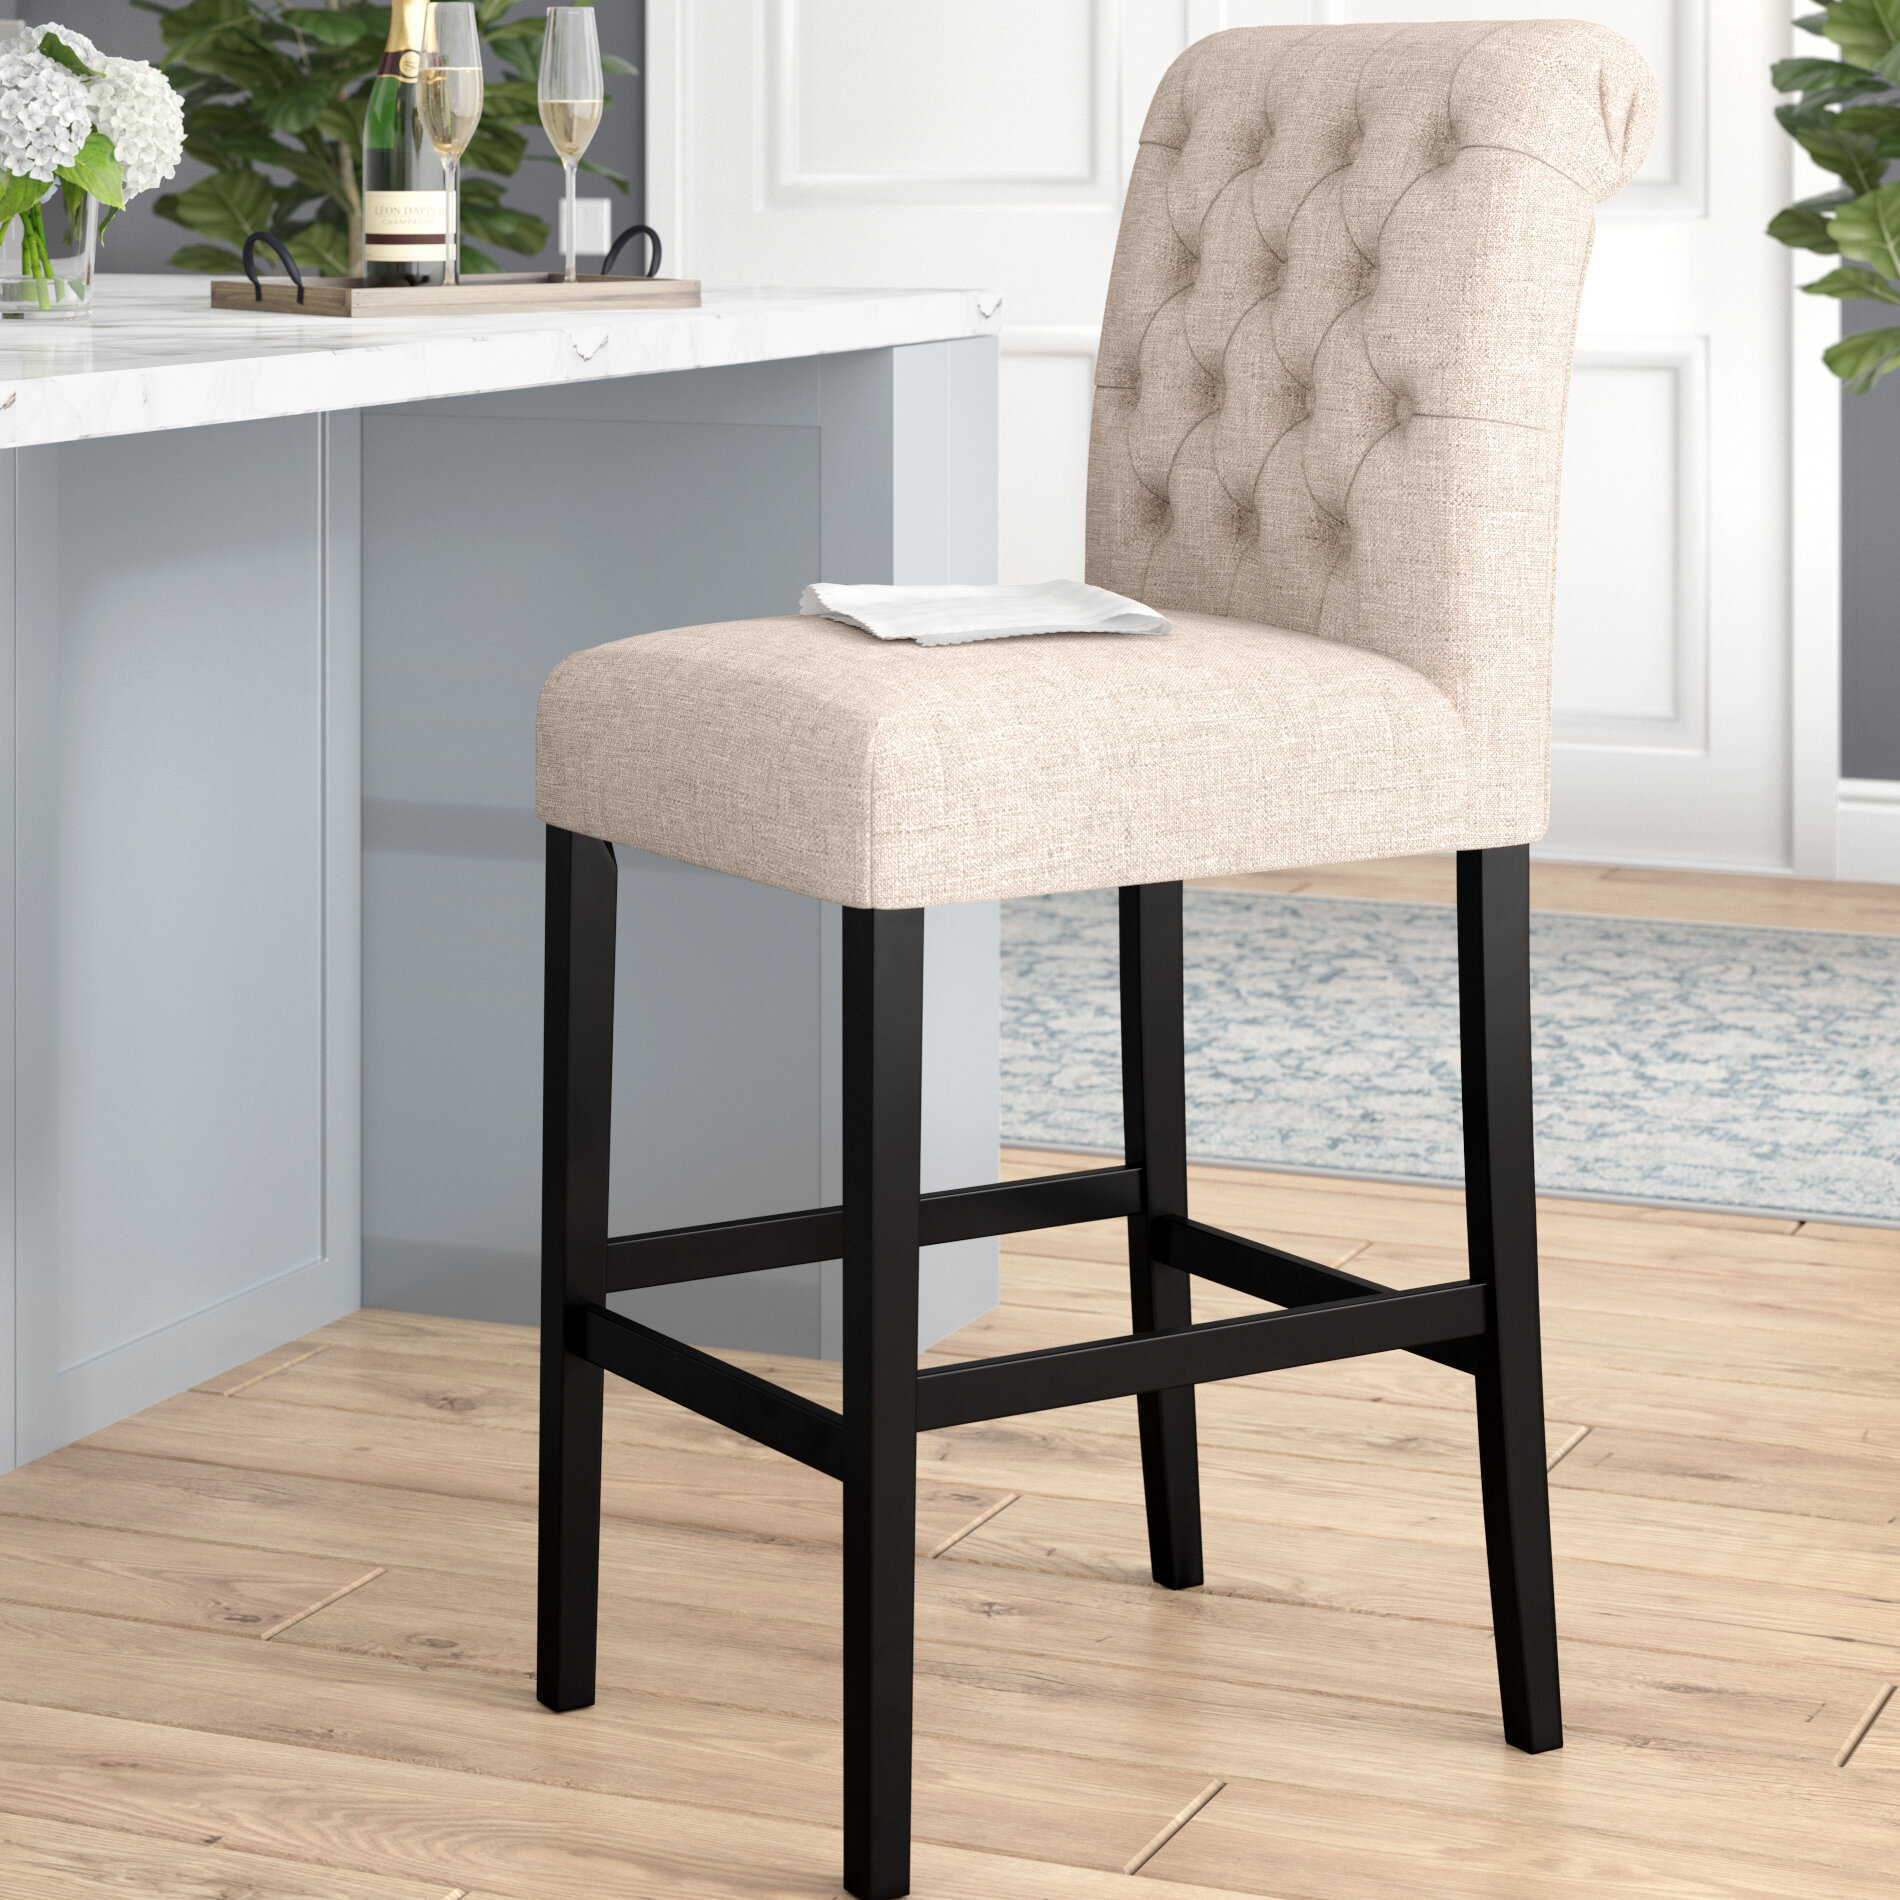 darby home co urbana tall upholstered bar stool reviews wayfair